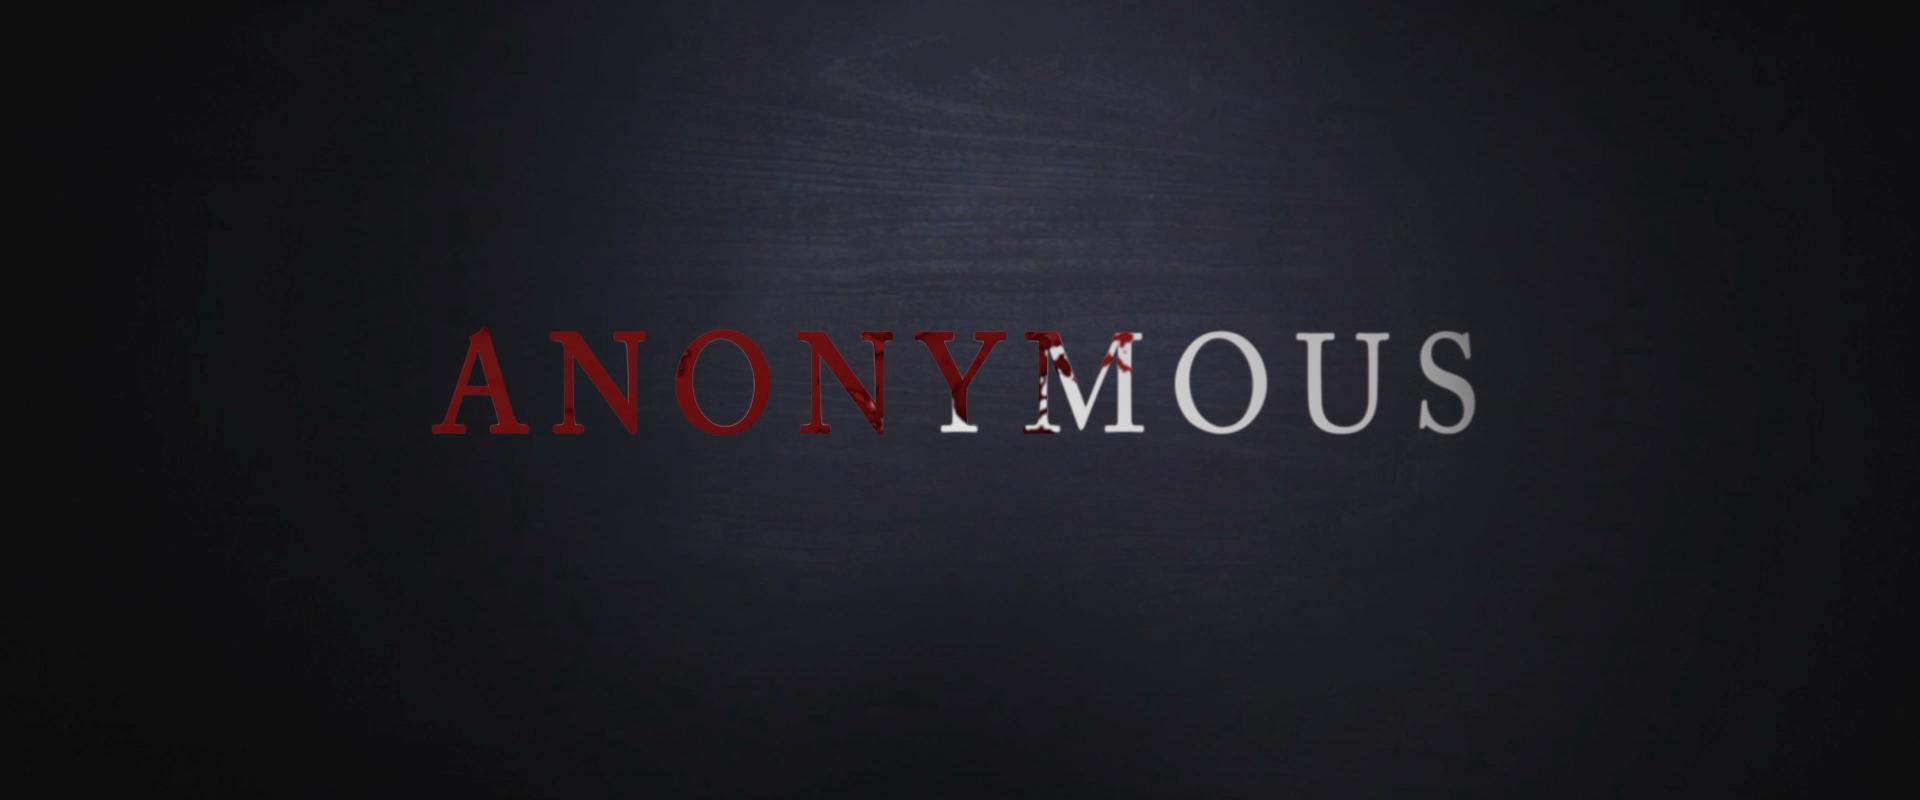 anonymous-1920x800-07.jpg